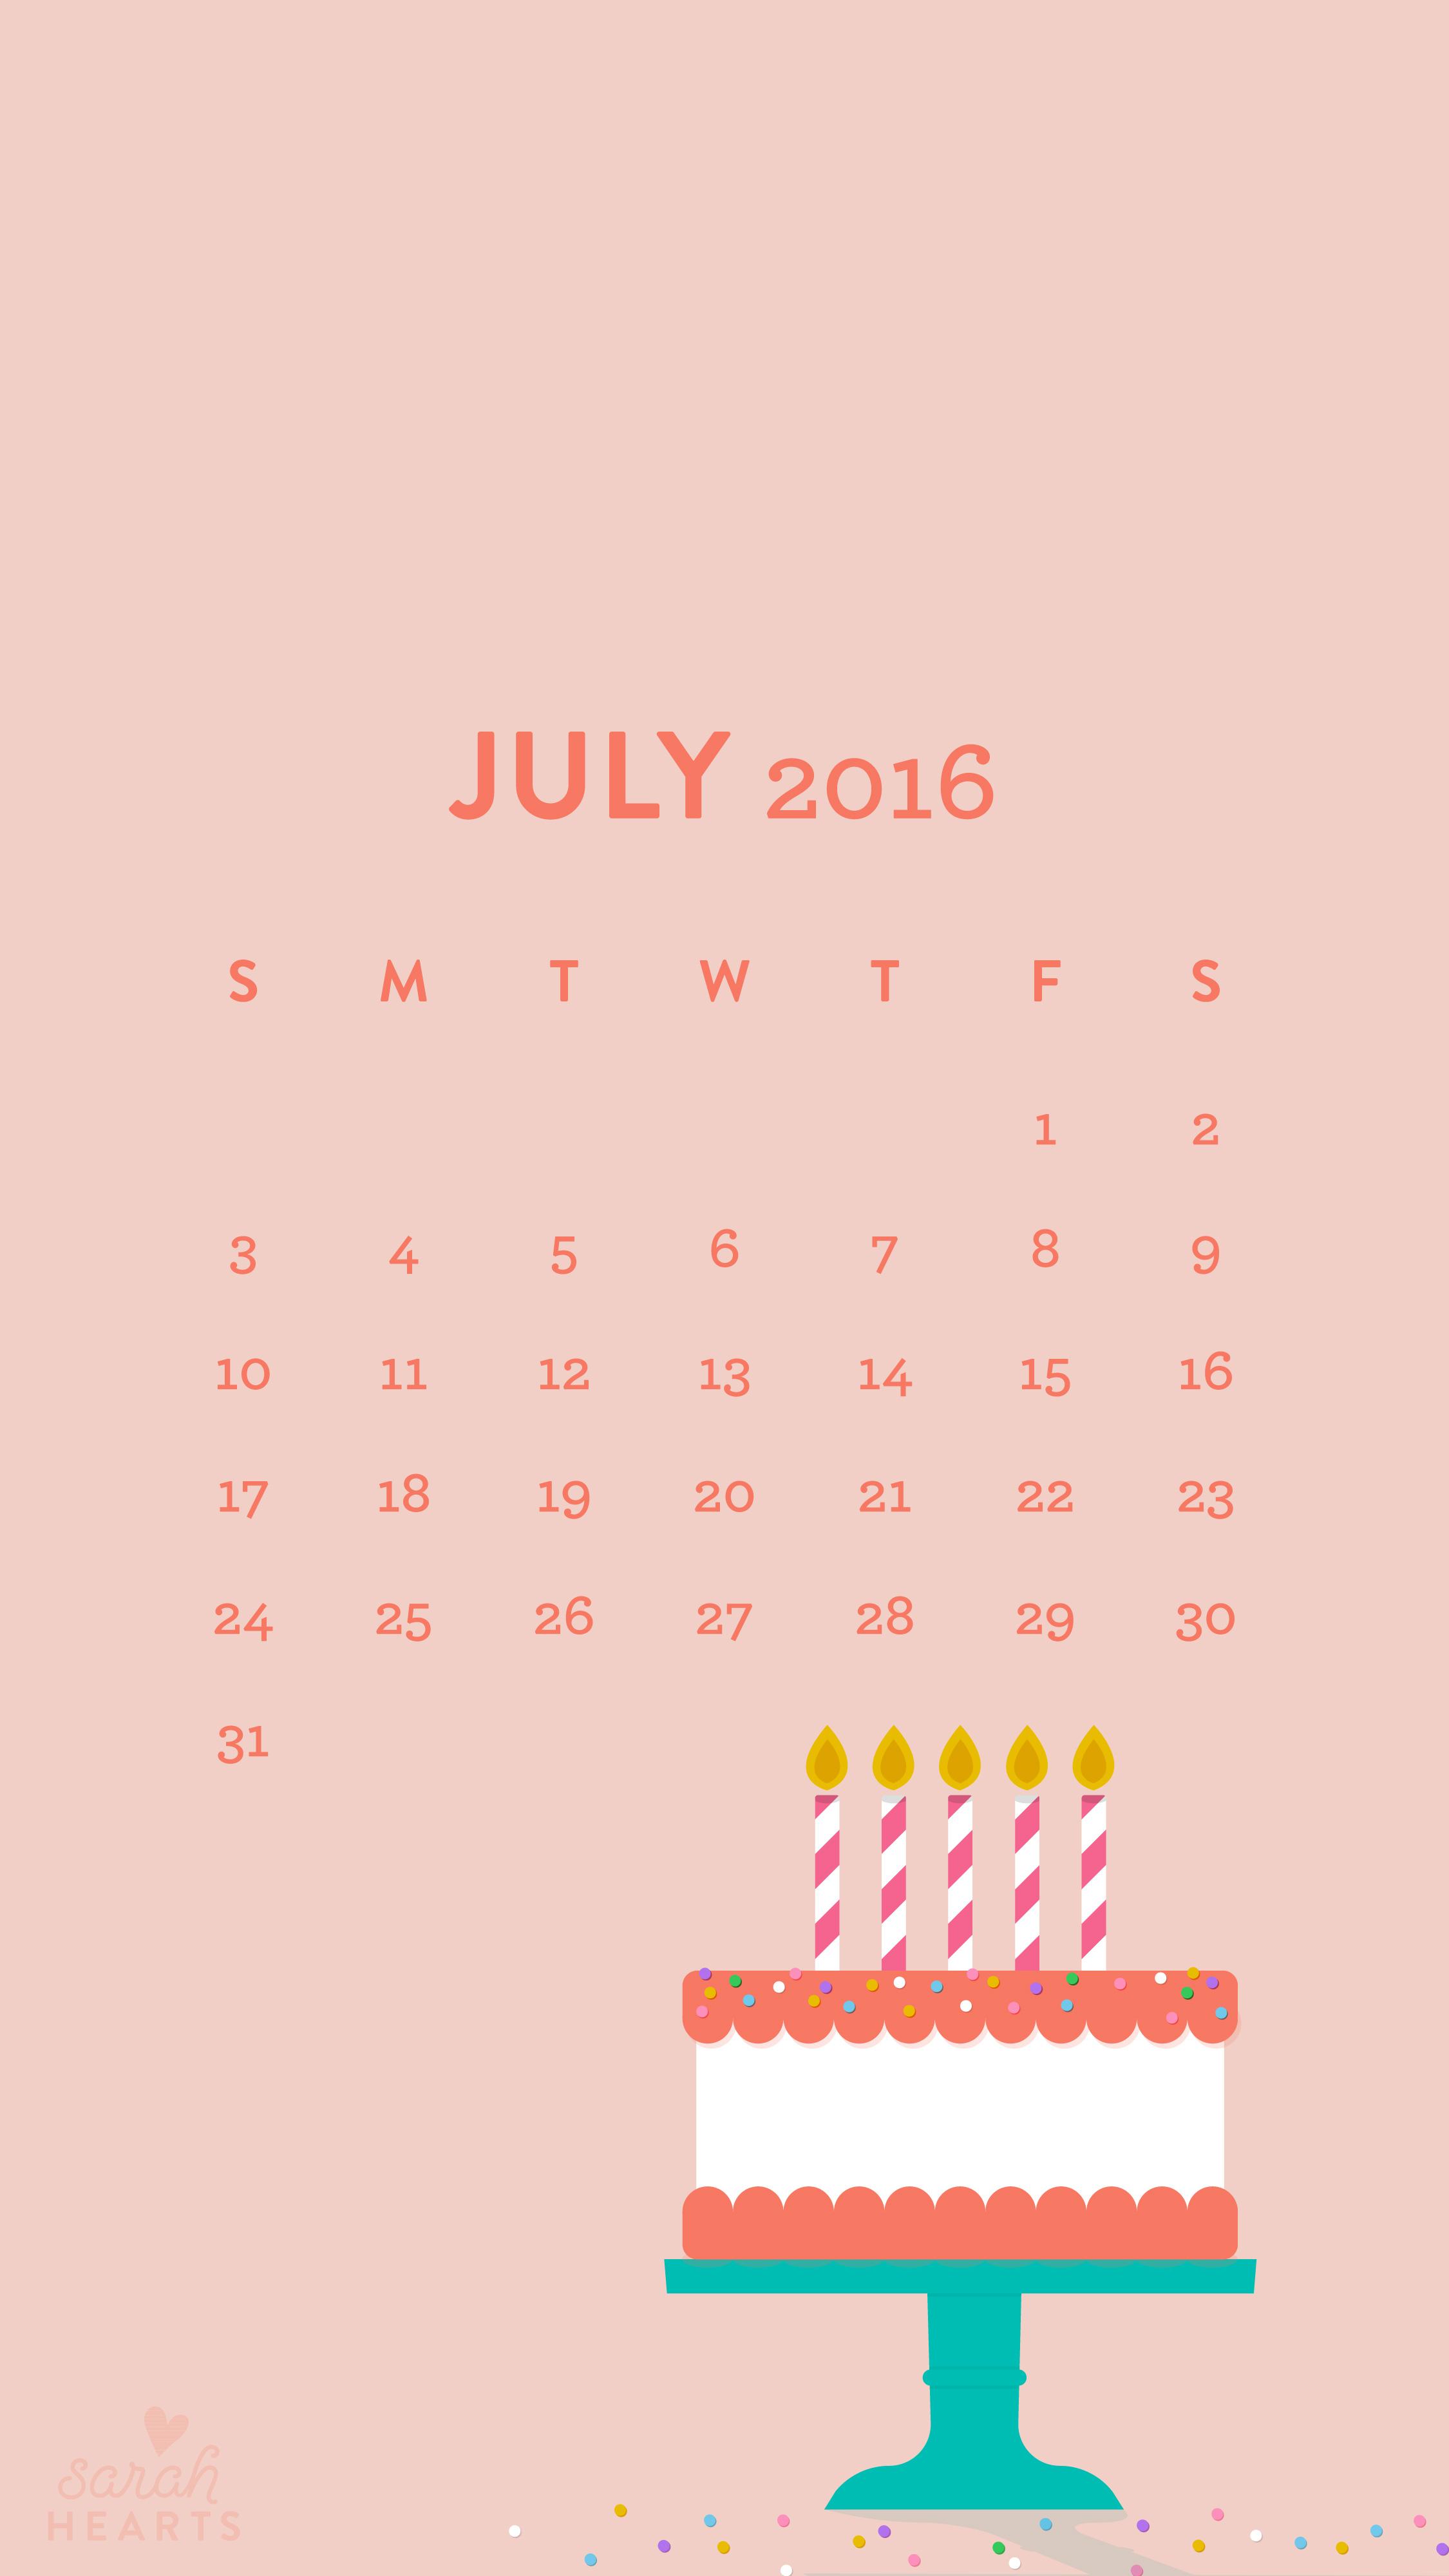 Cute Birthday Cake Wallpaper July 2016 Birthday Cake Calendar Wallpaper Sarah Hearts